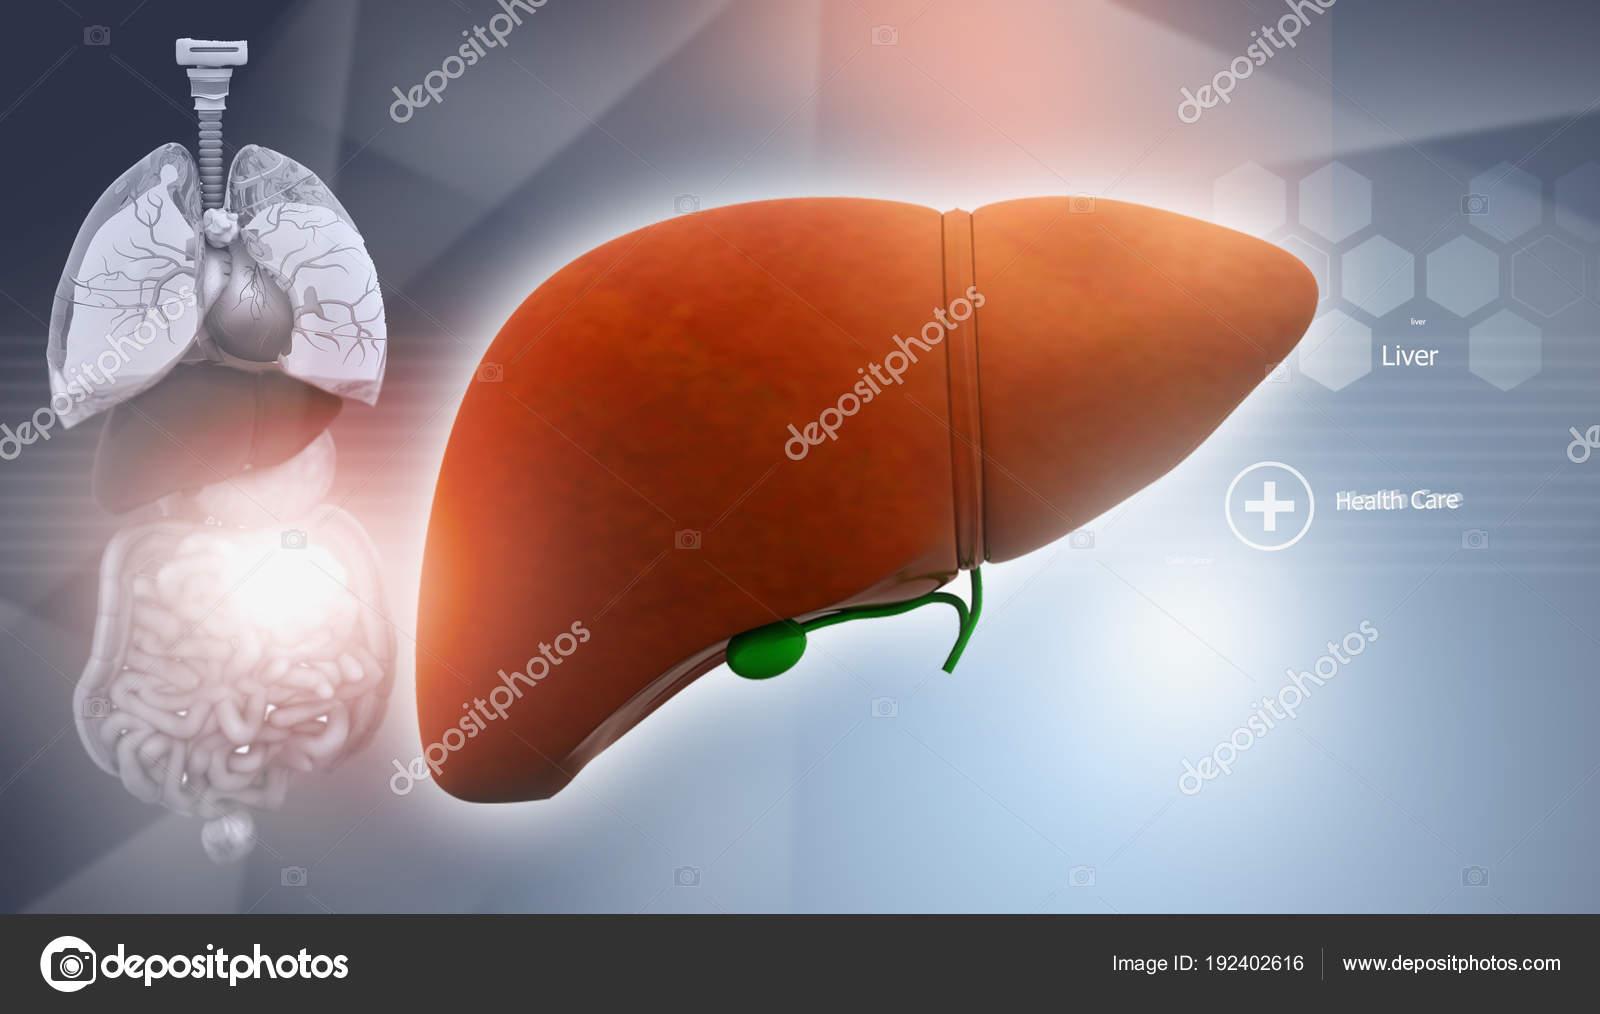 Anatomía Humana Con Hígado Ilustración — Fotos de Stock ...